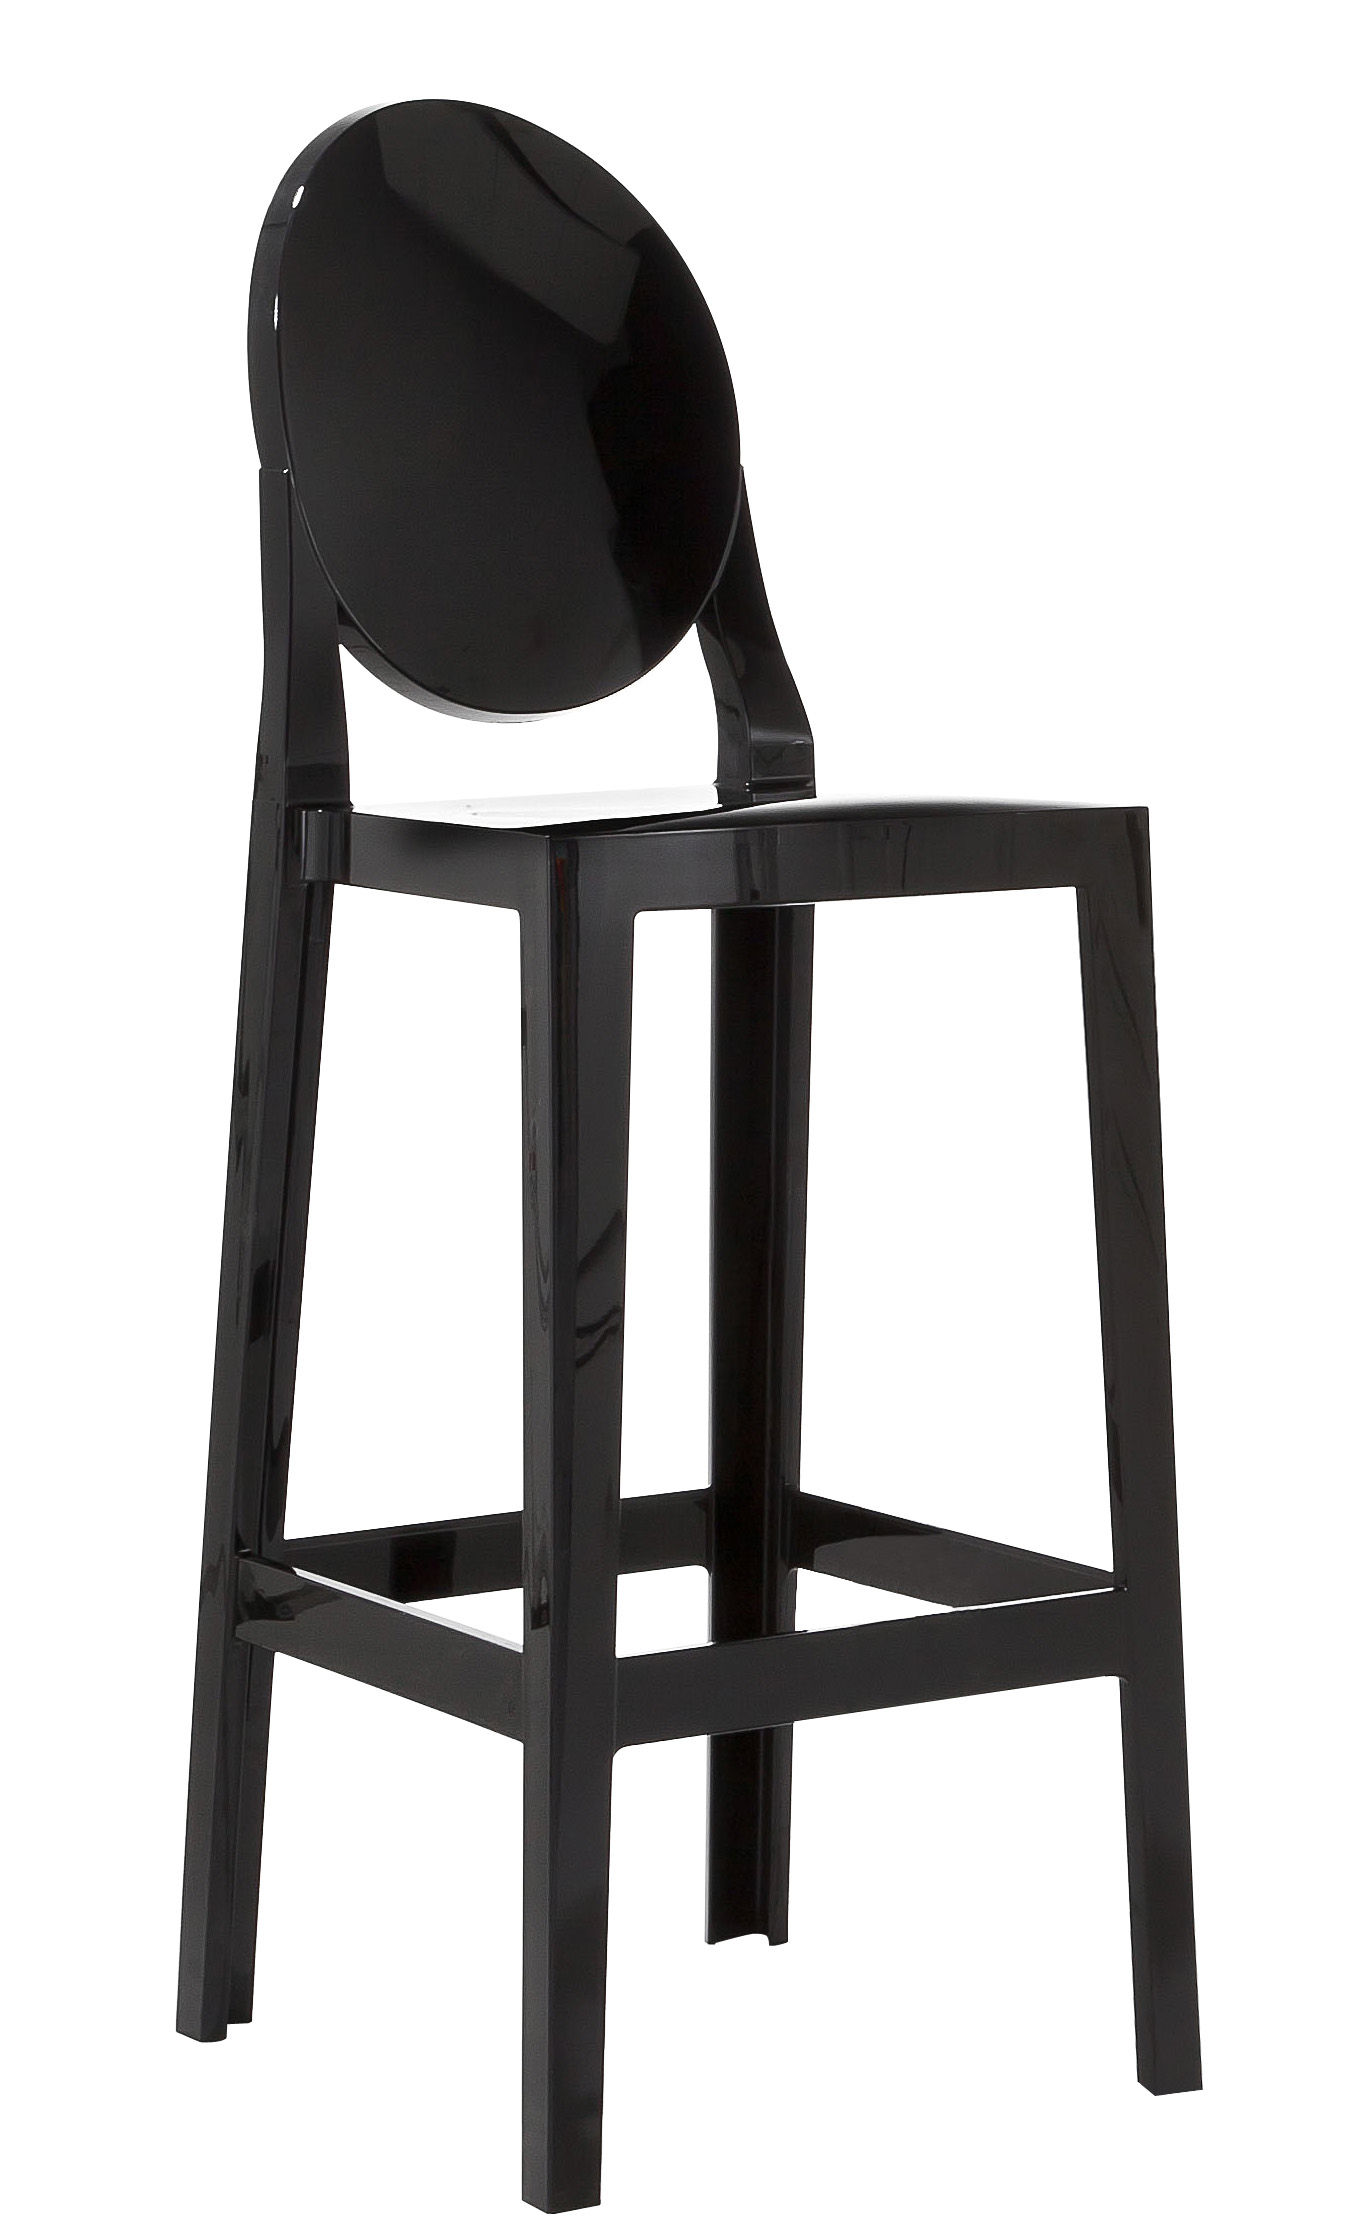 chaise de bar one more h 65cm plastique noir kartell. Black Bedroom Furniture Sets. Home Design Ideas